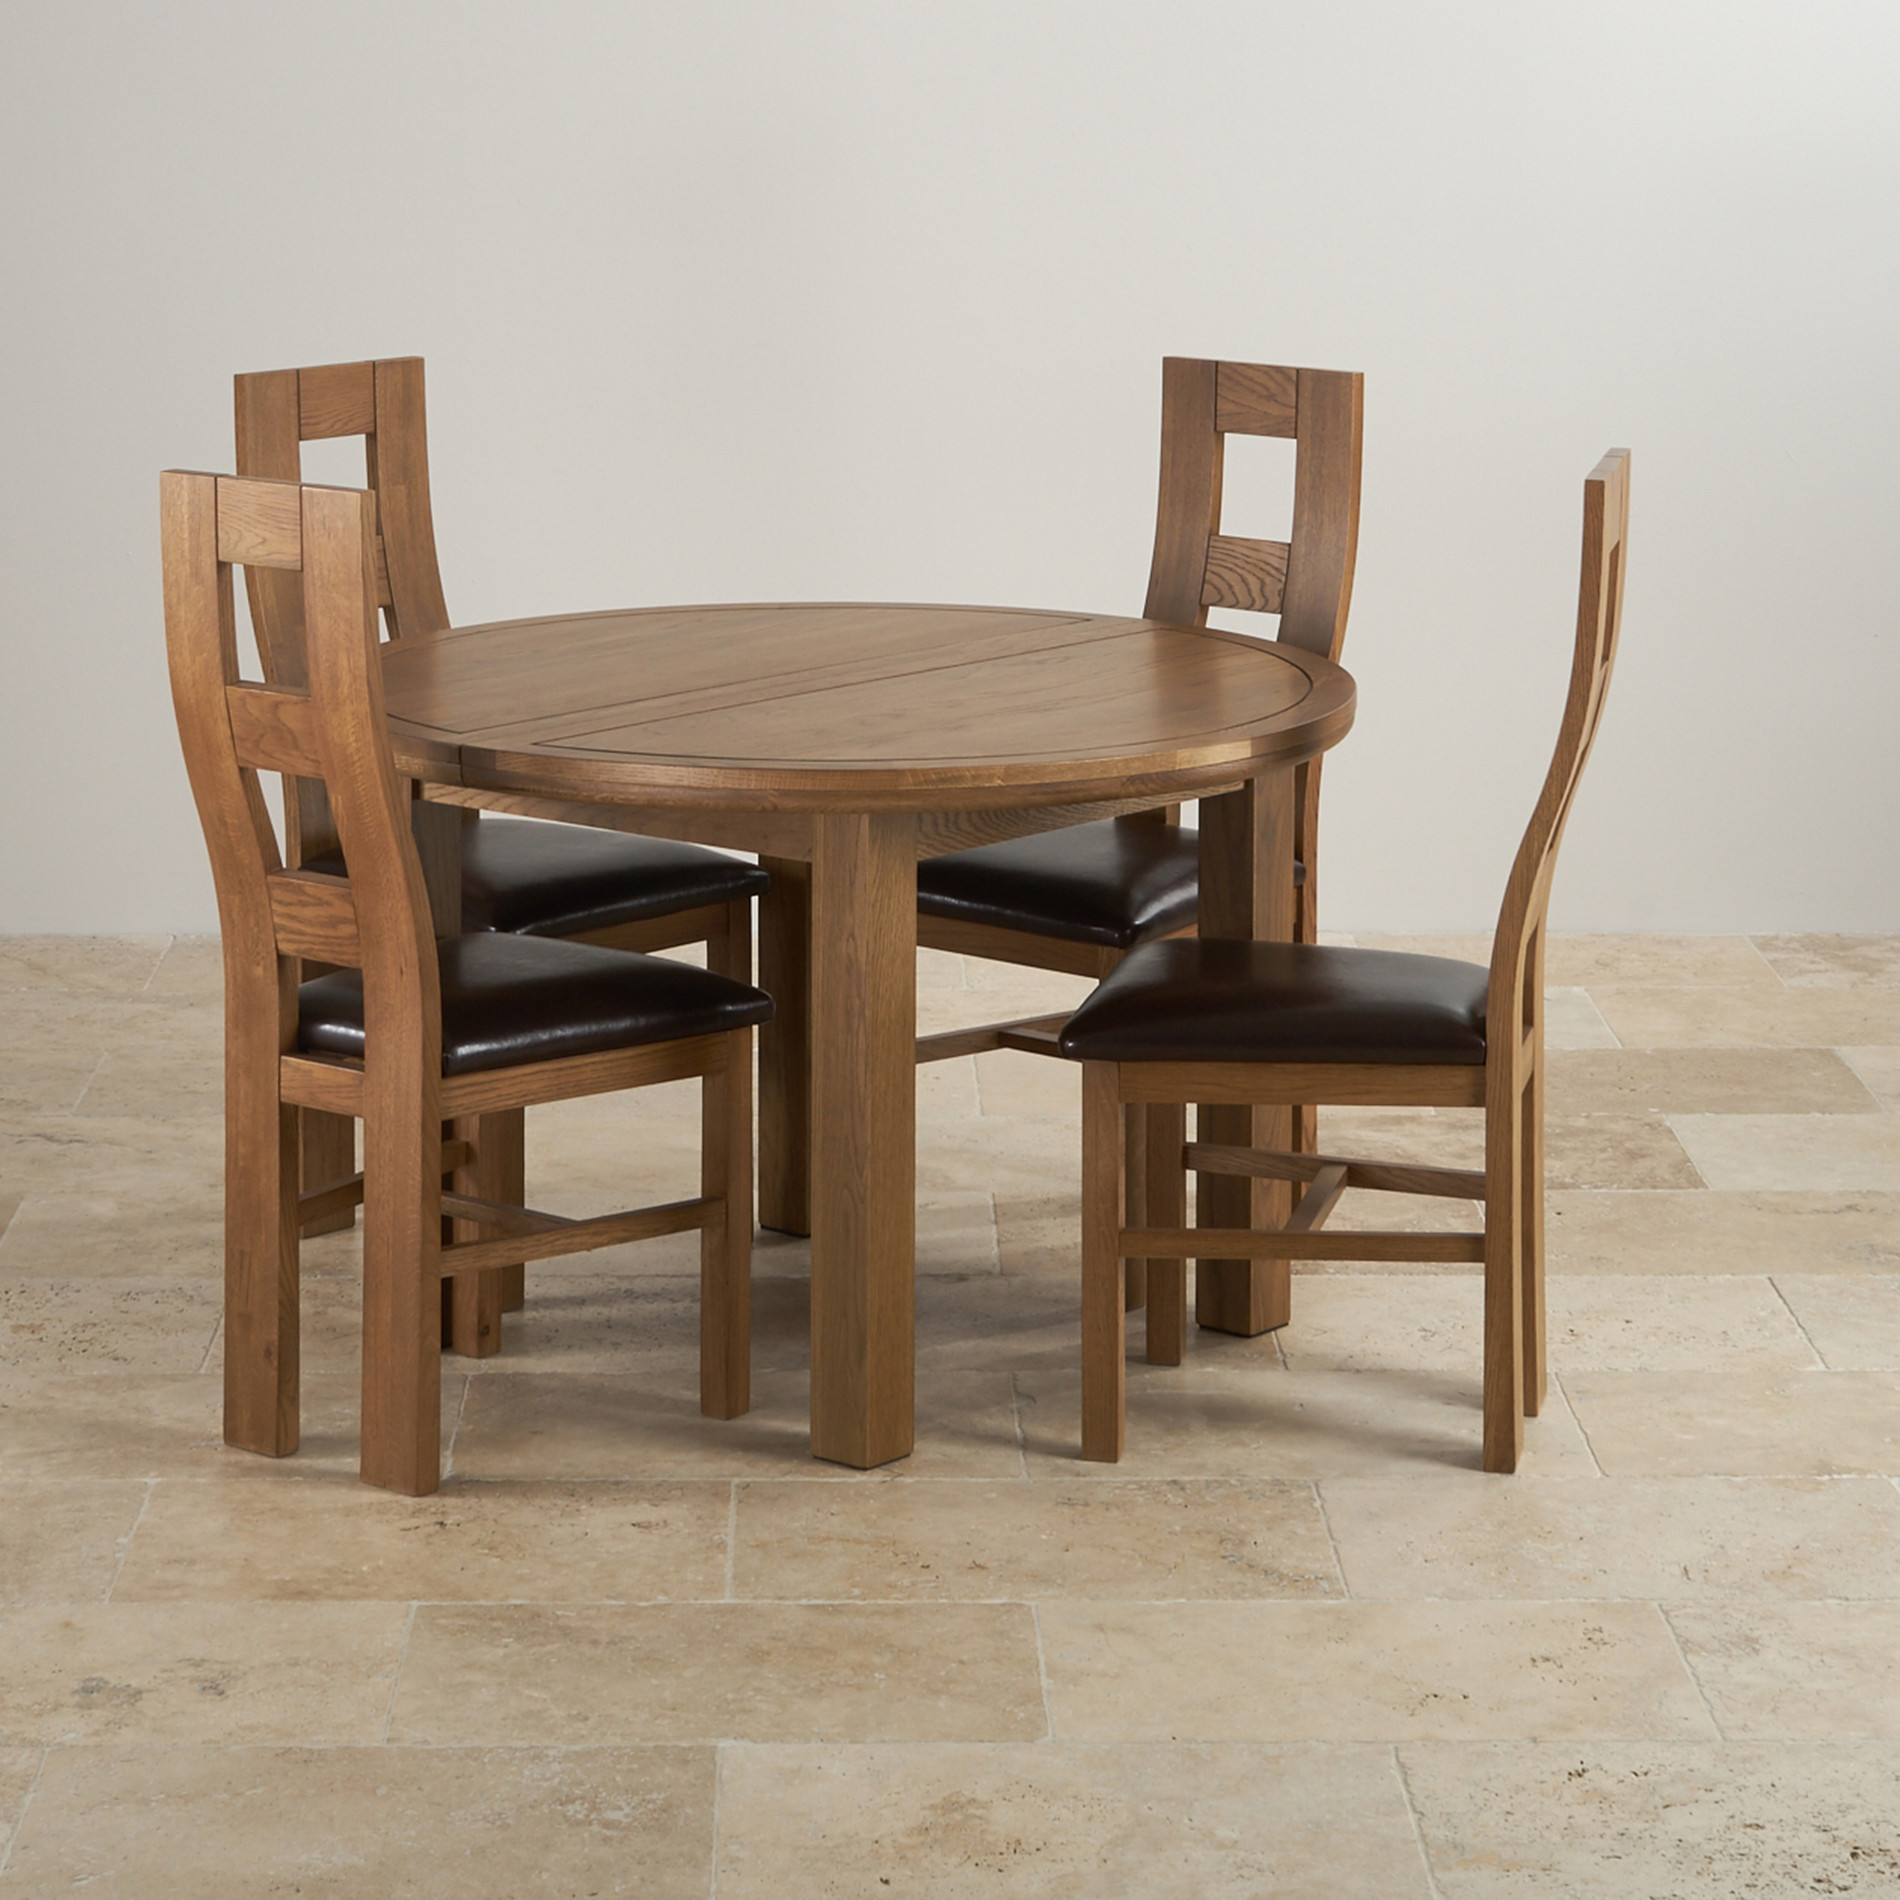 Dark oak dining room chairs